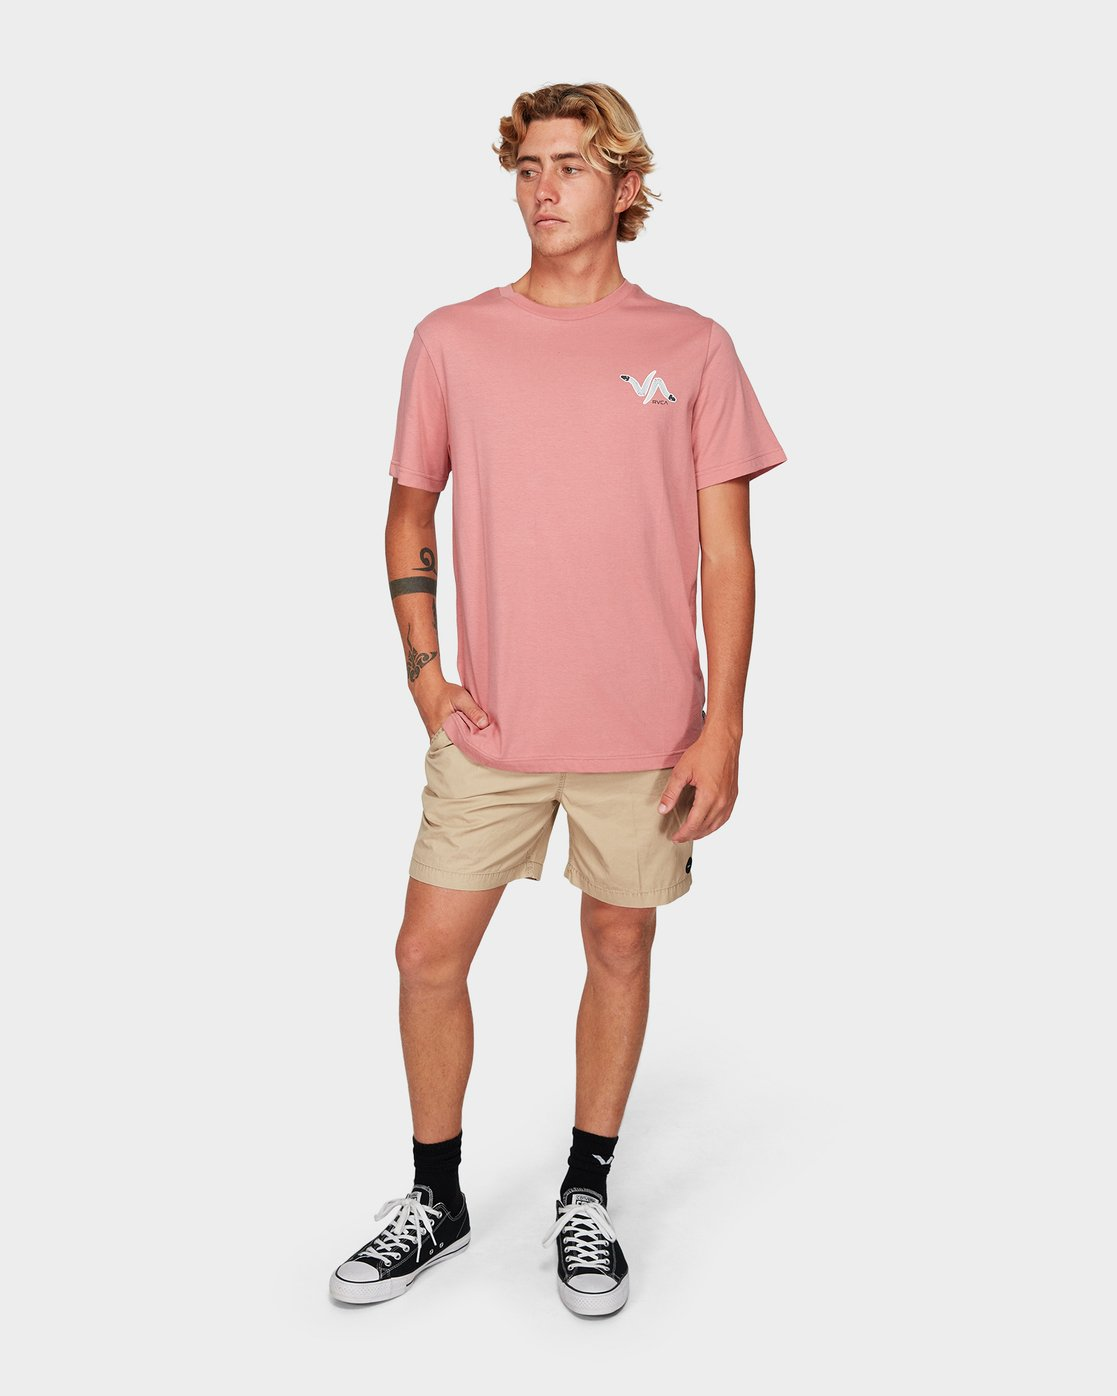 3 Snakey Snake Short Sleeve T-Shirt Pink R192055 RVCA